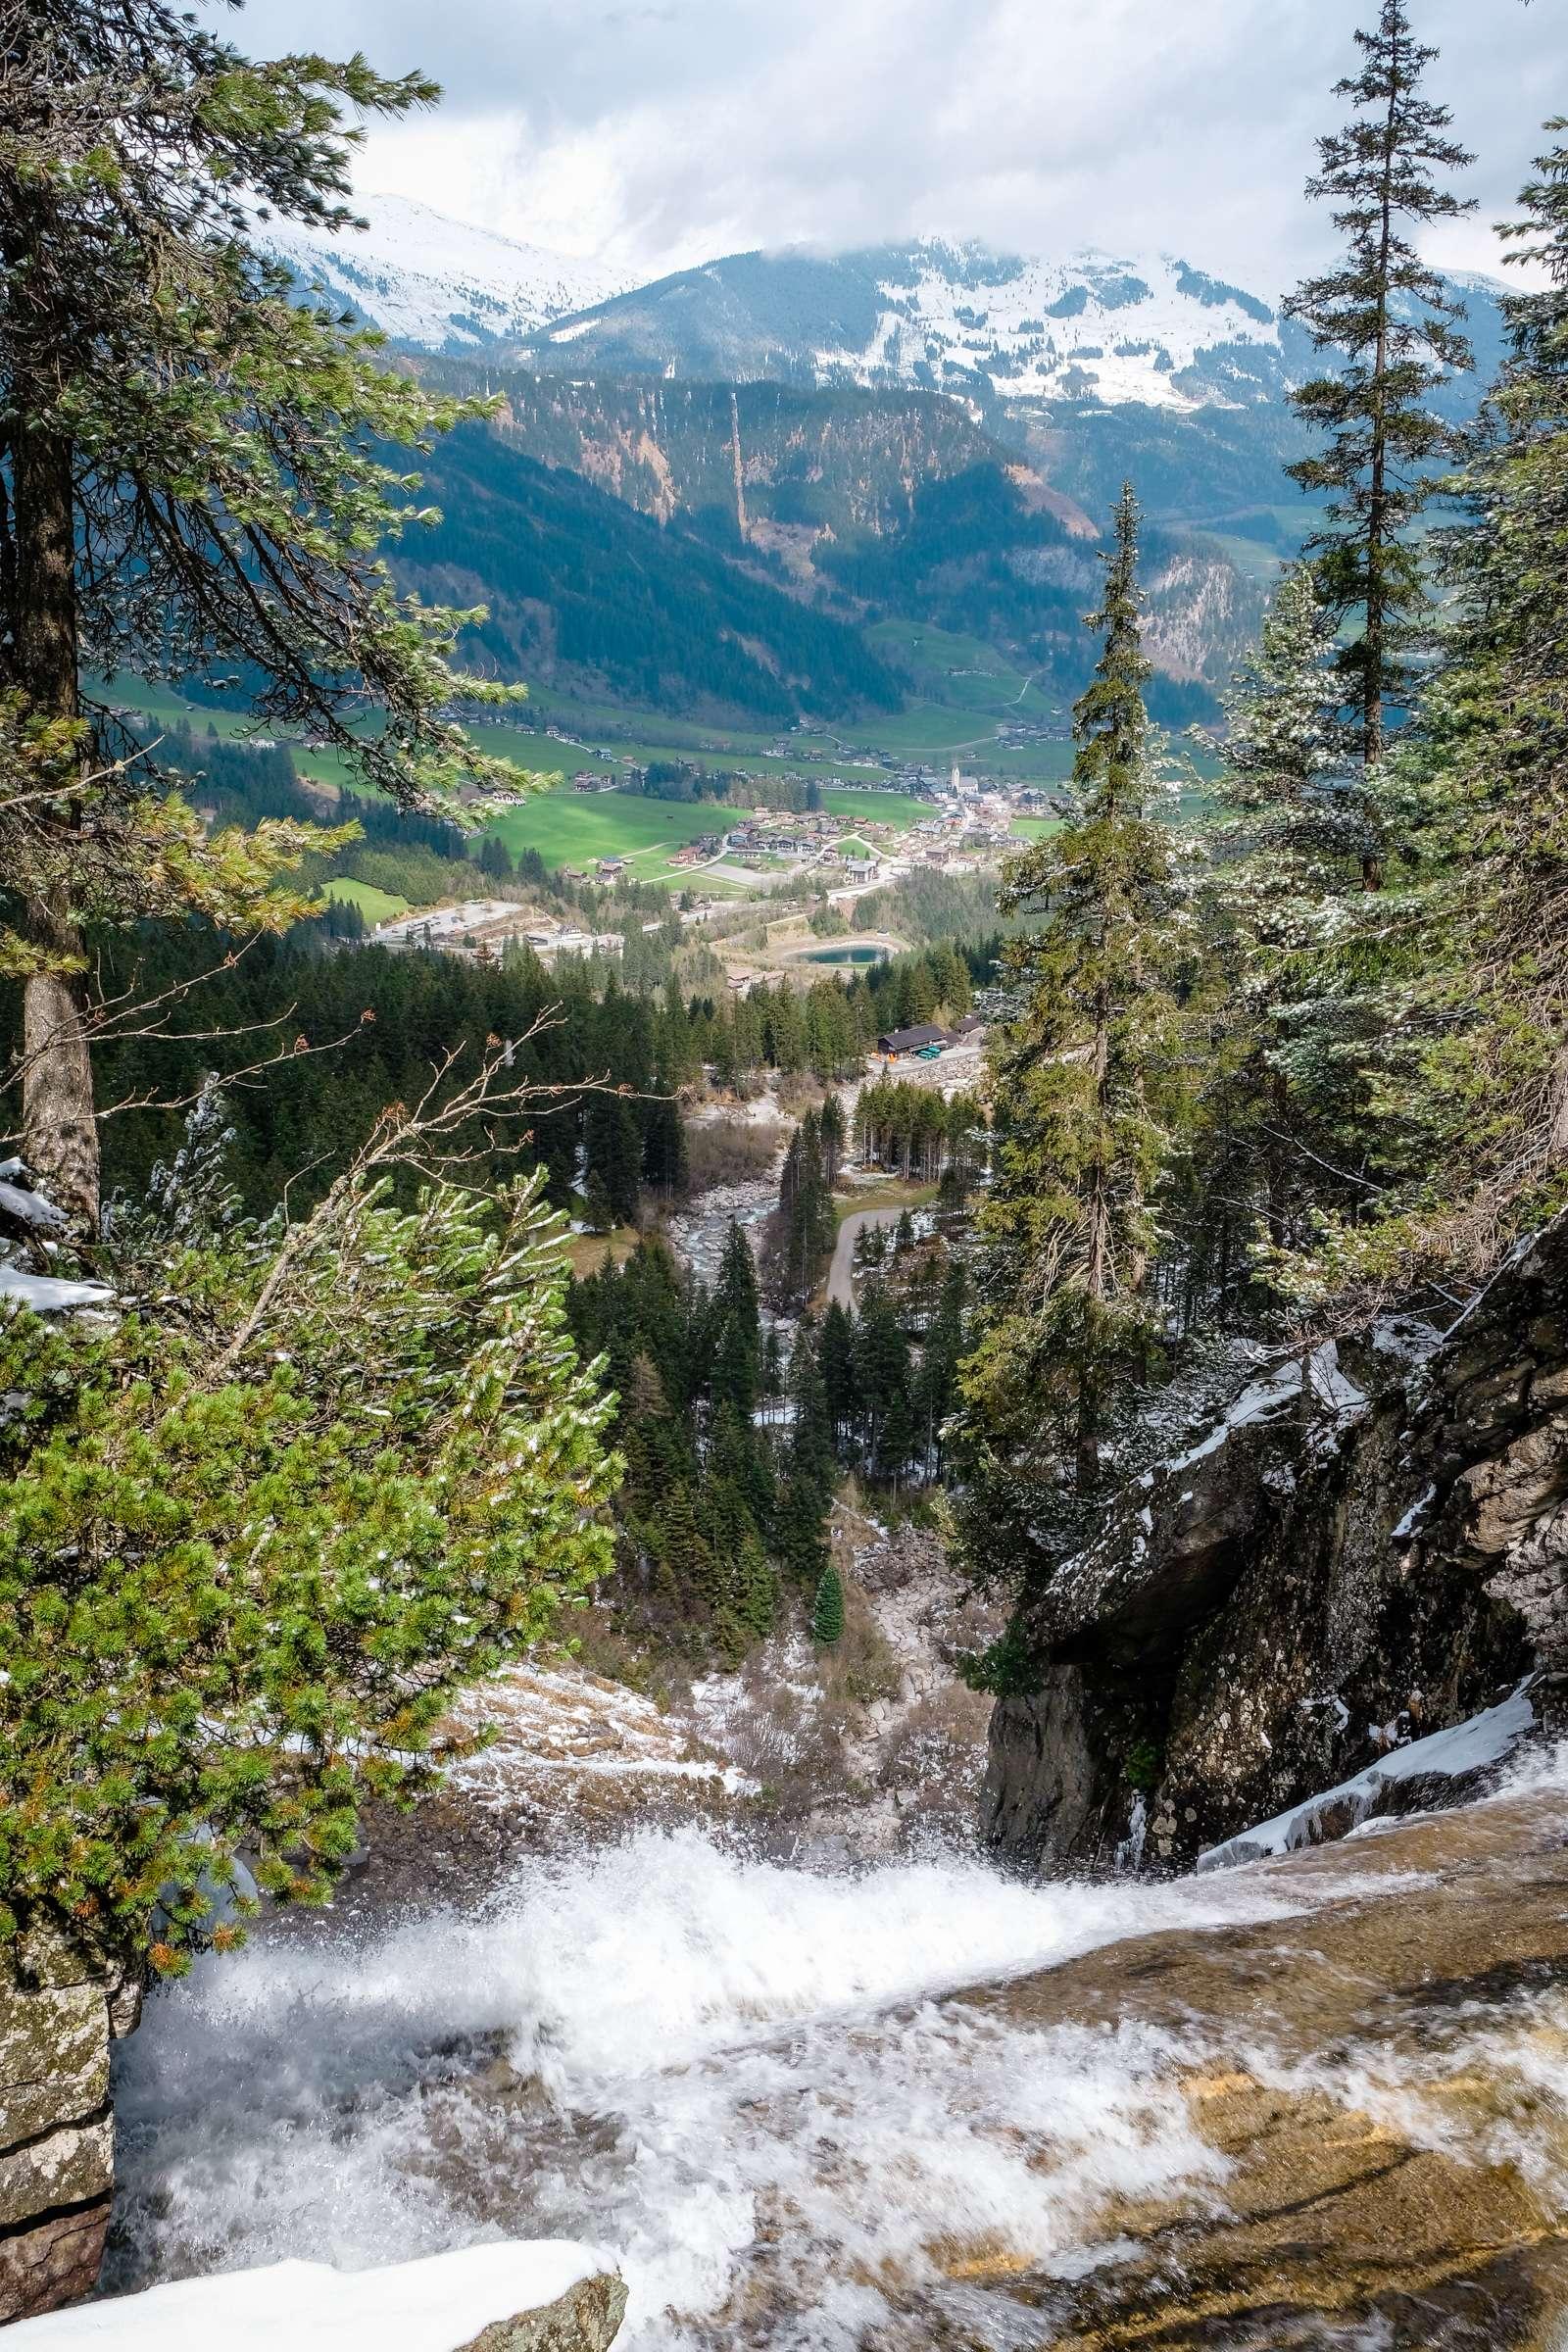 Looking over the top of Krimml waterfalls to the valley below